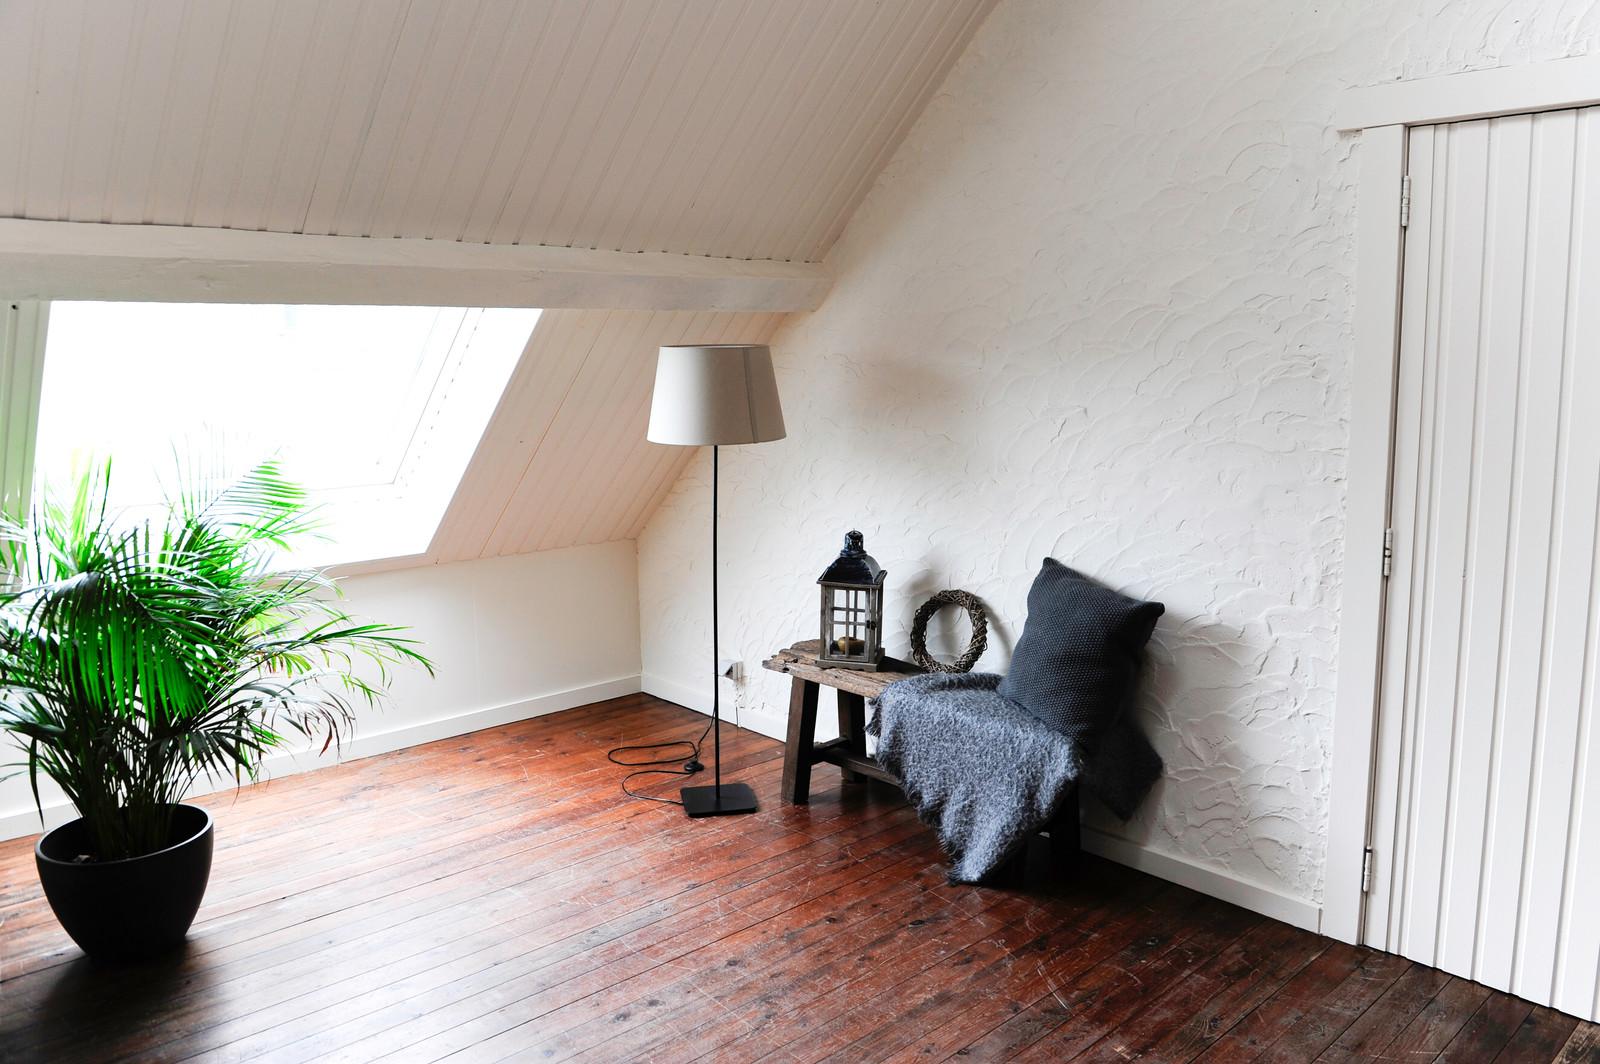 Vide In Huis : Afbeeldingsresultaat voor vide in huis woning